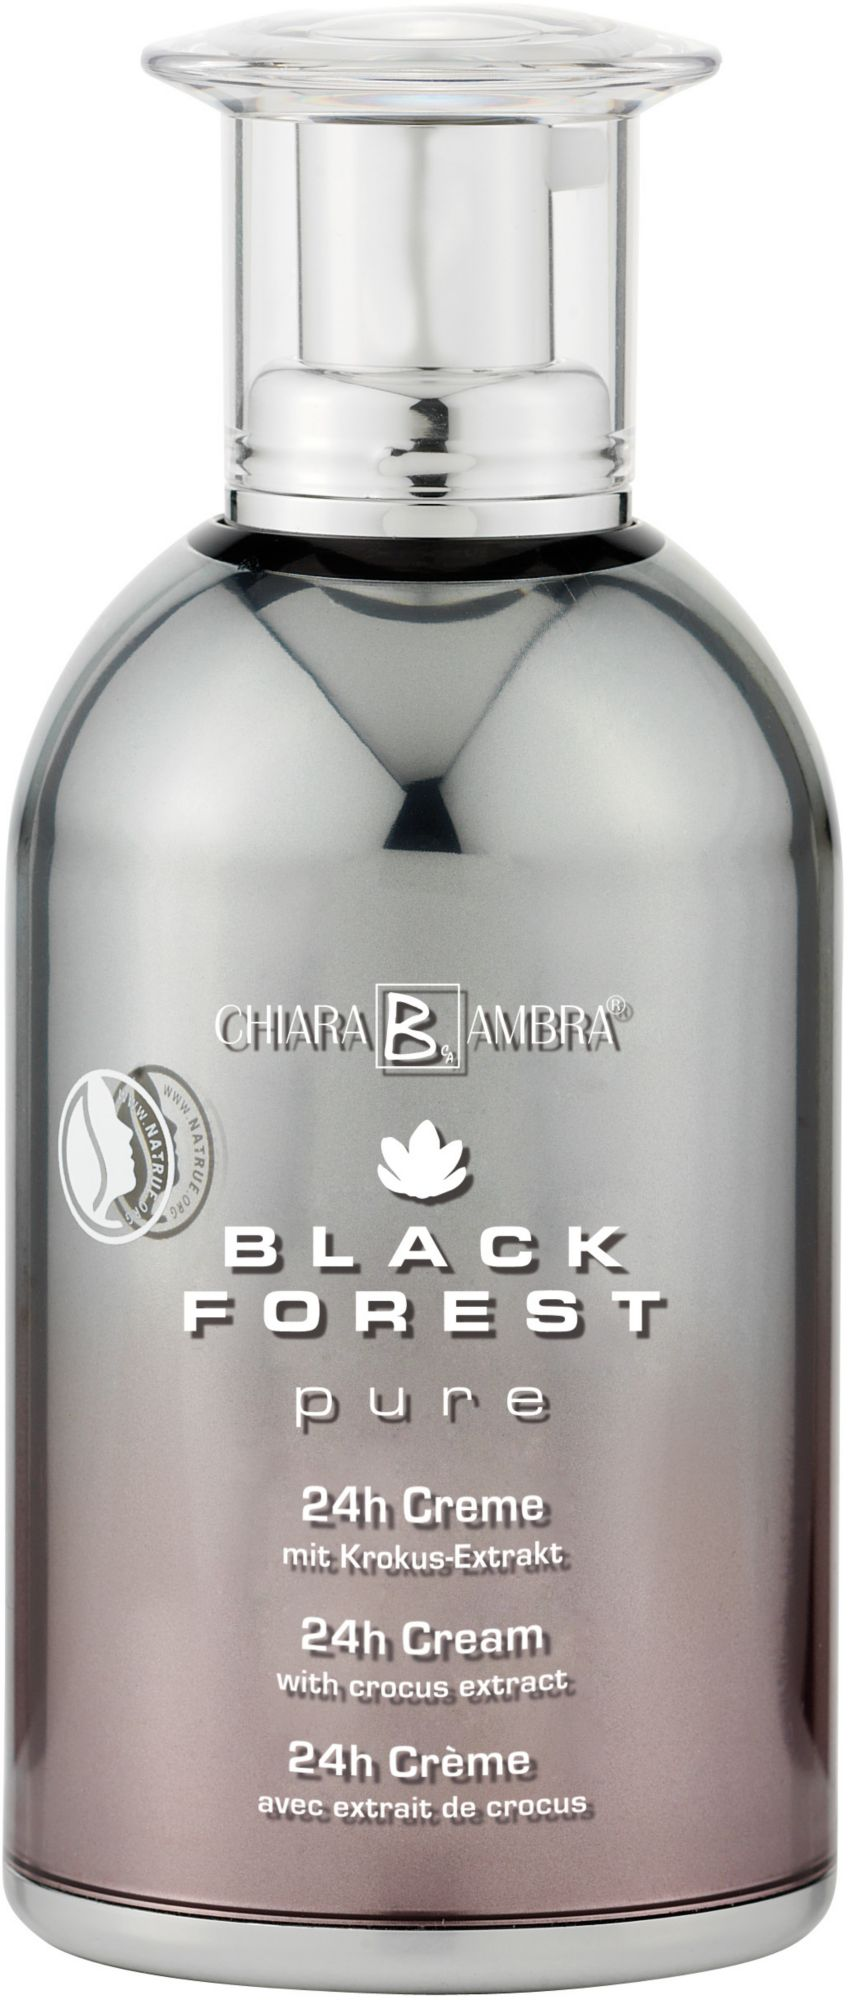 CHIARA AMBRA BF Pure 24 Cream Chiara B. Ambra schwarz